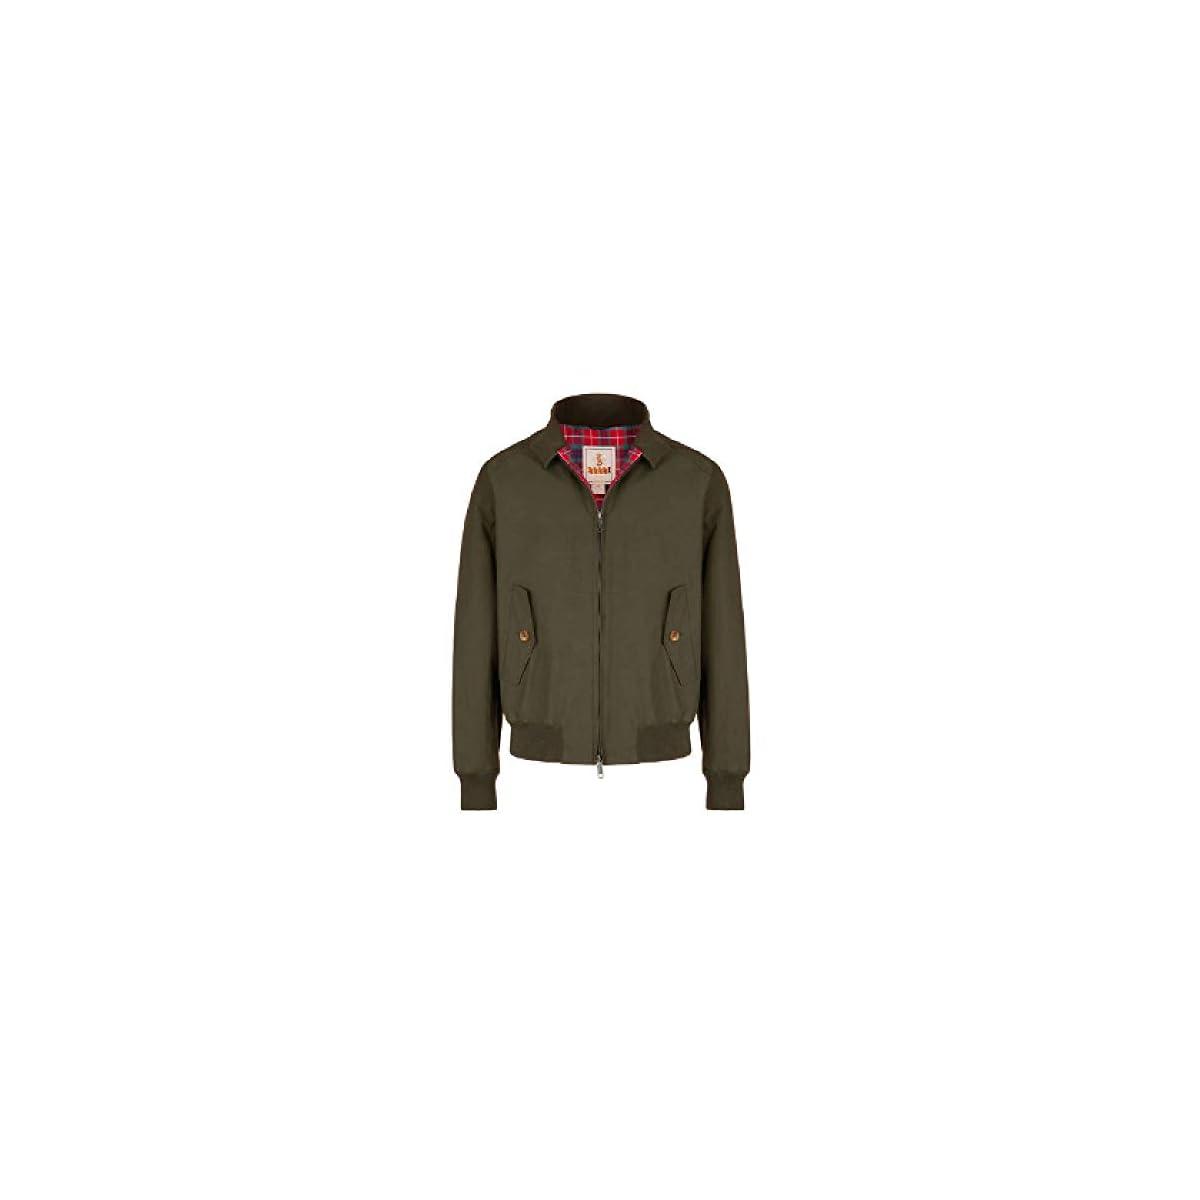 Baracuta G9 Harrington Jacket Beige